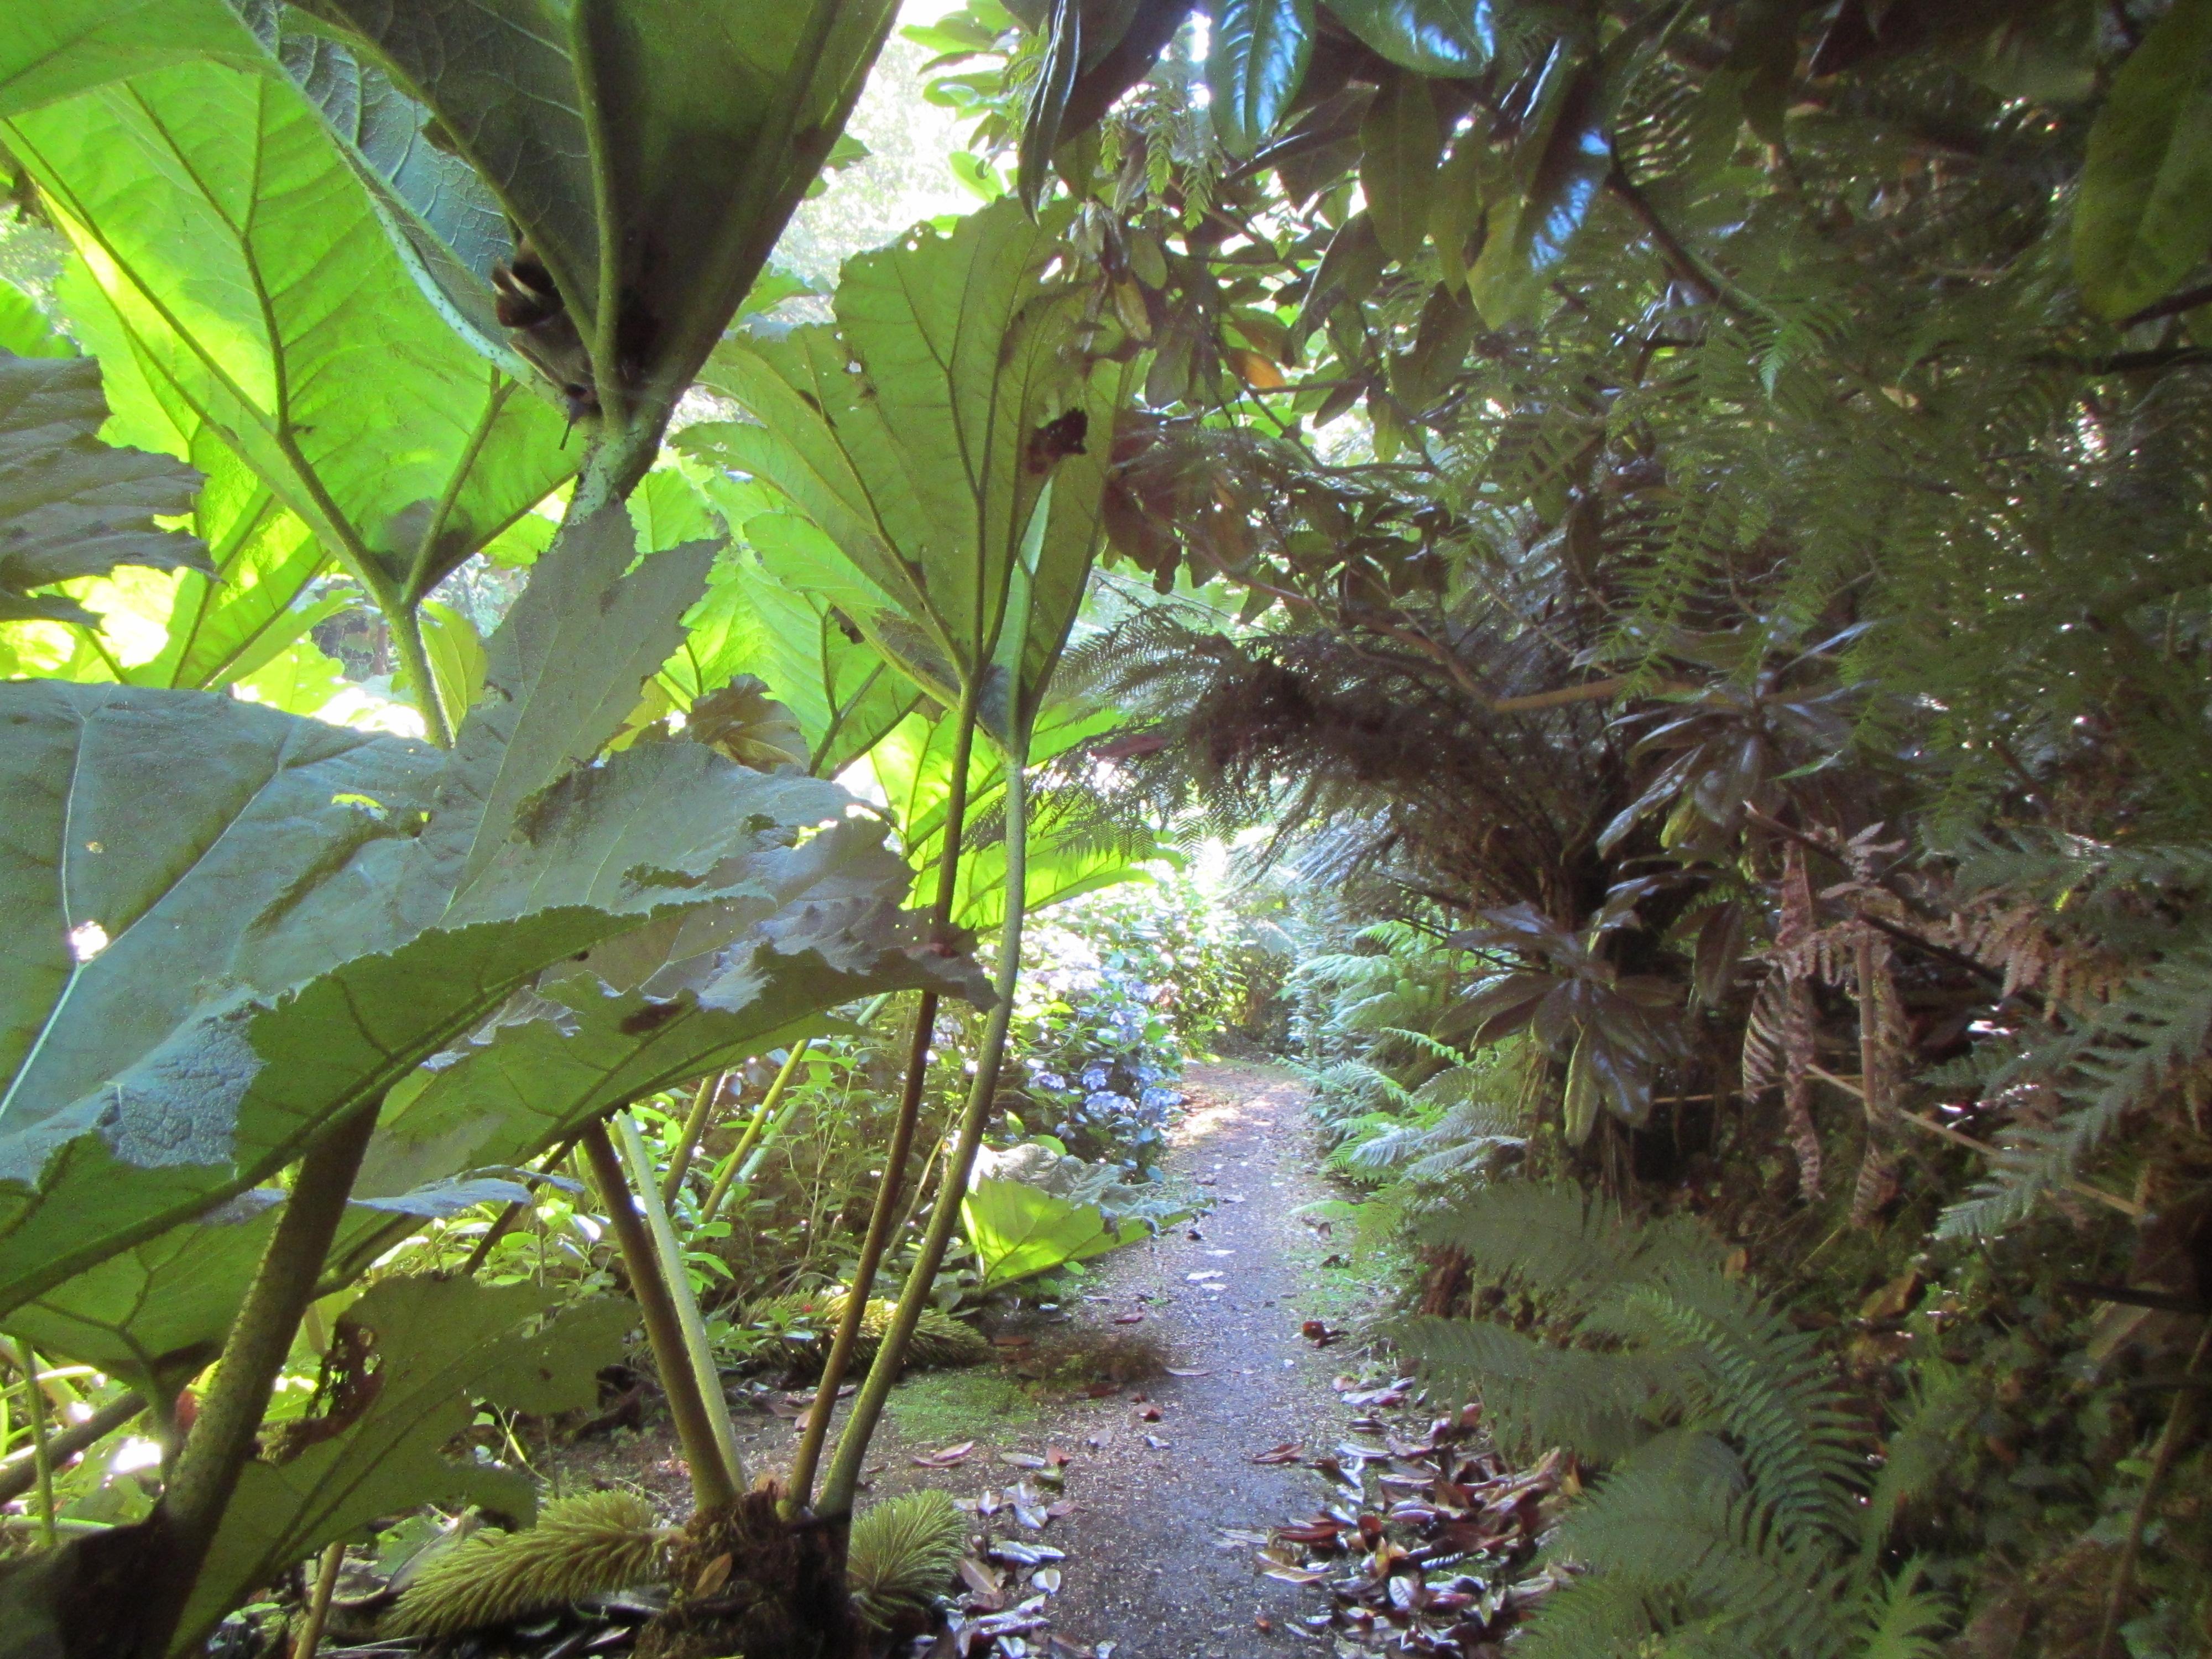 Giant Rubarb walkway adds to the Frenchman's Creek Kayak Adventures this Autumn